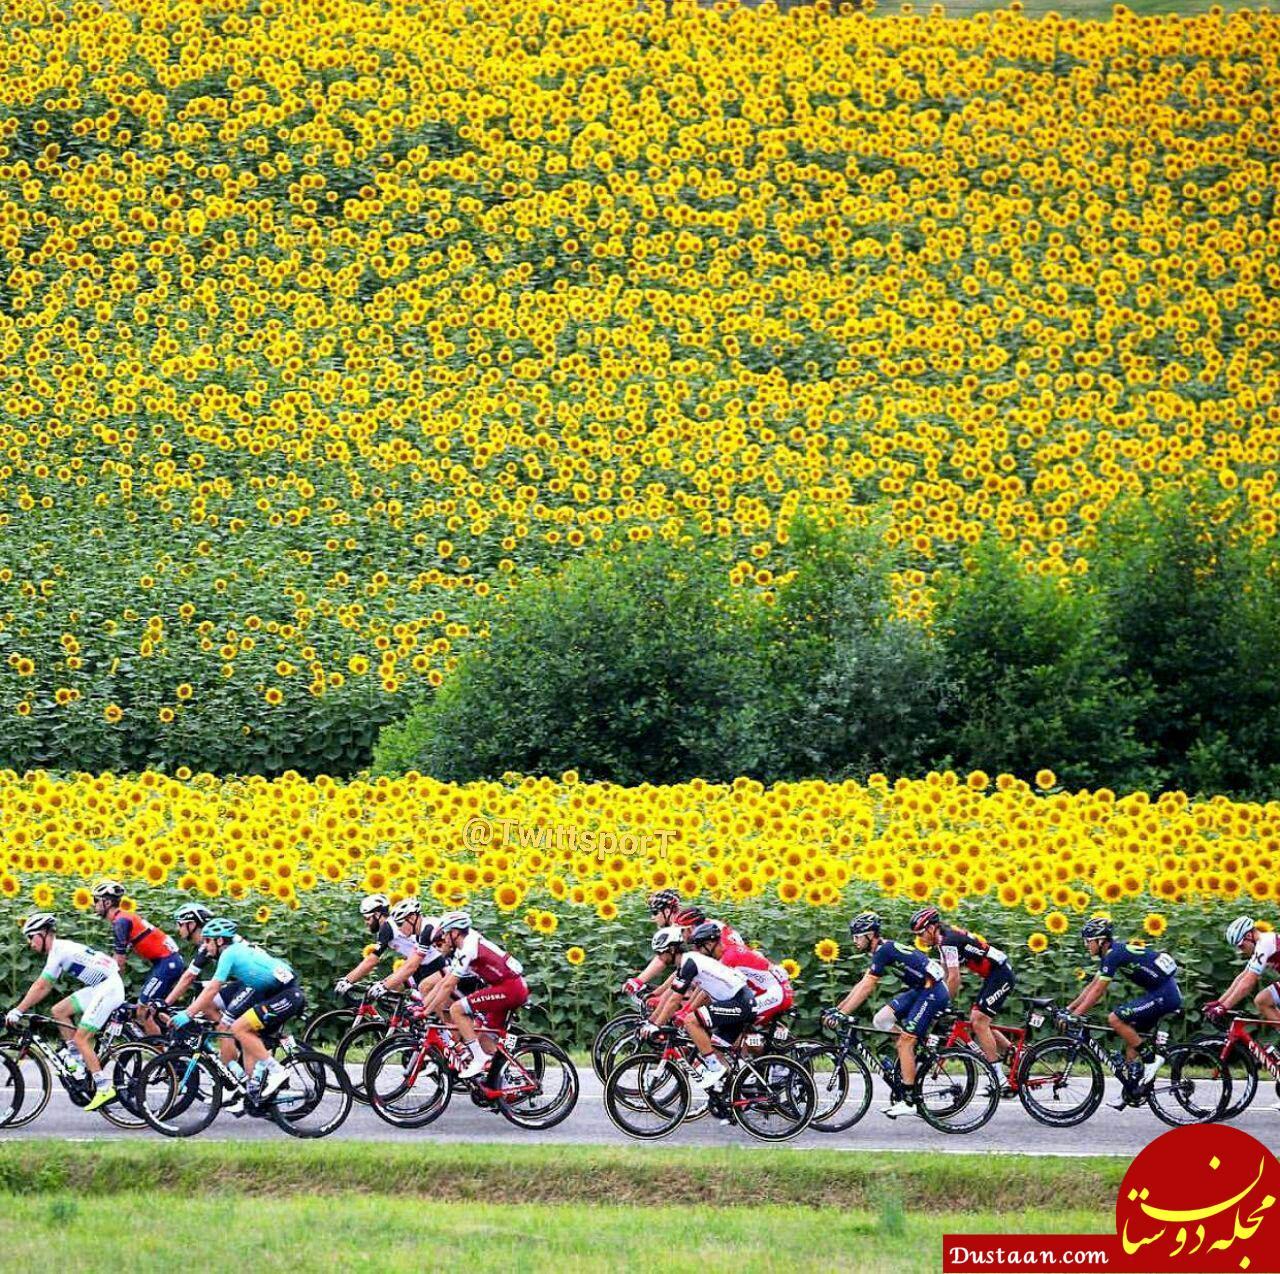 www.dustaan.com عکس حیرت انگیز از یک مسابقه دوچرخه سواری